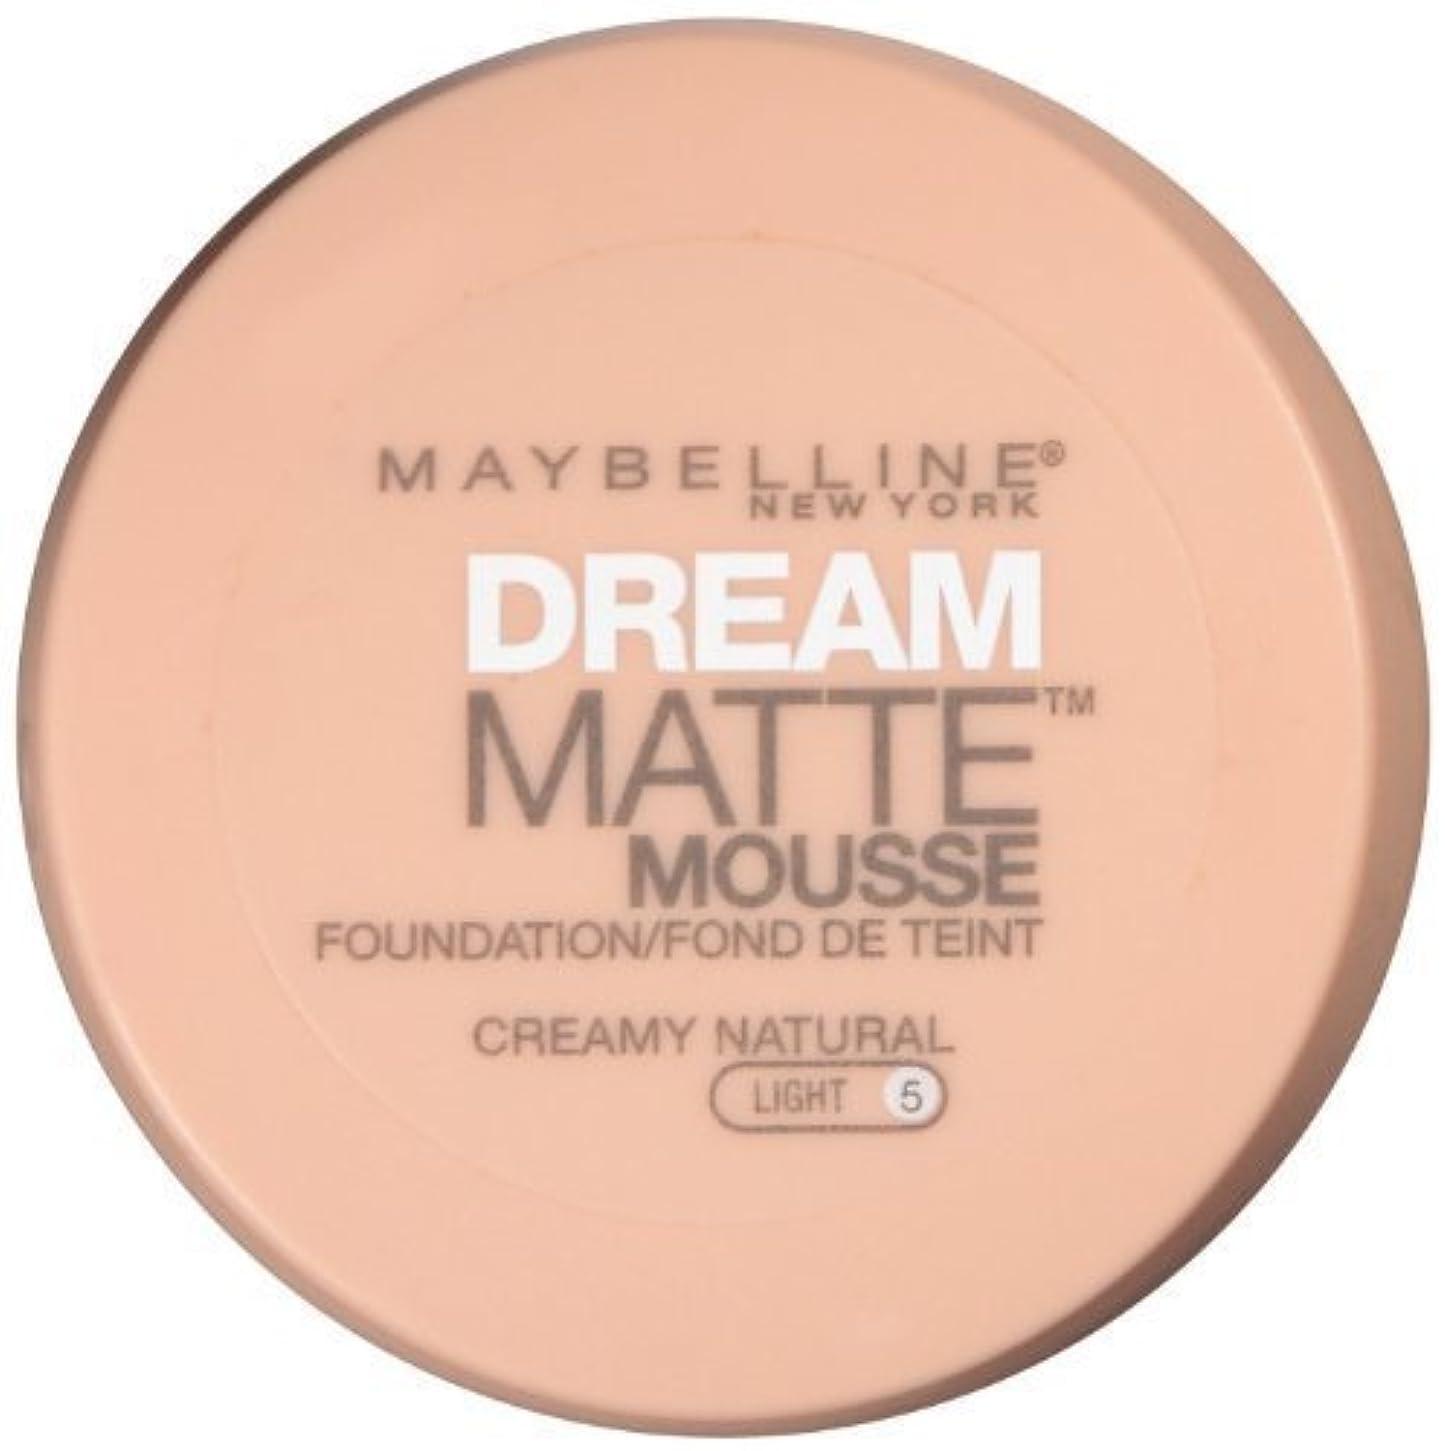 土器専門知識最初MAYBELLINE Dream Matte Mousse - Creamy Natural (並行輸入品)